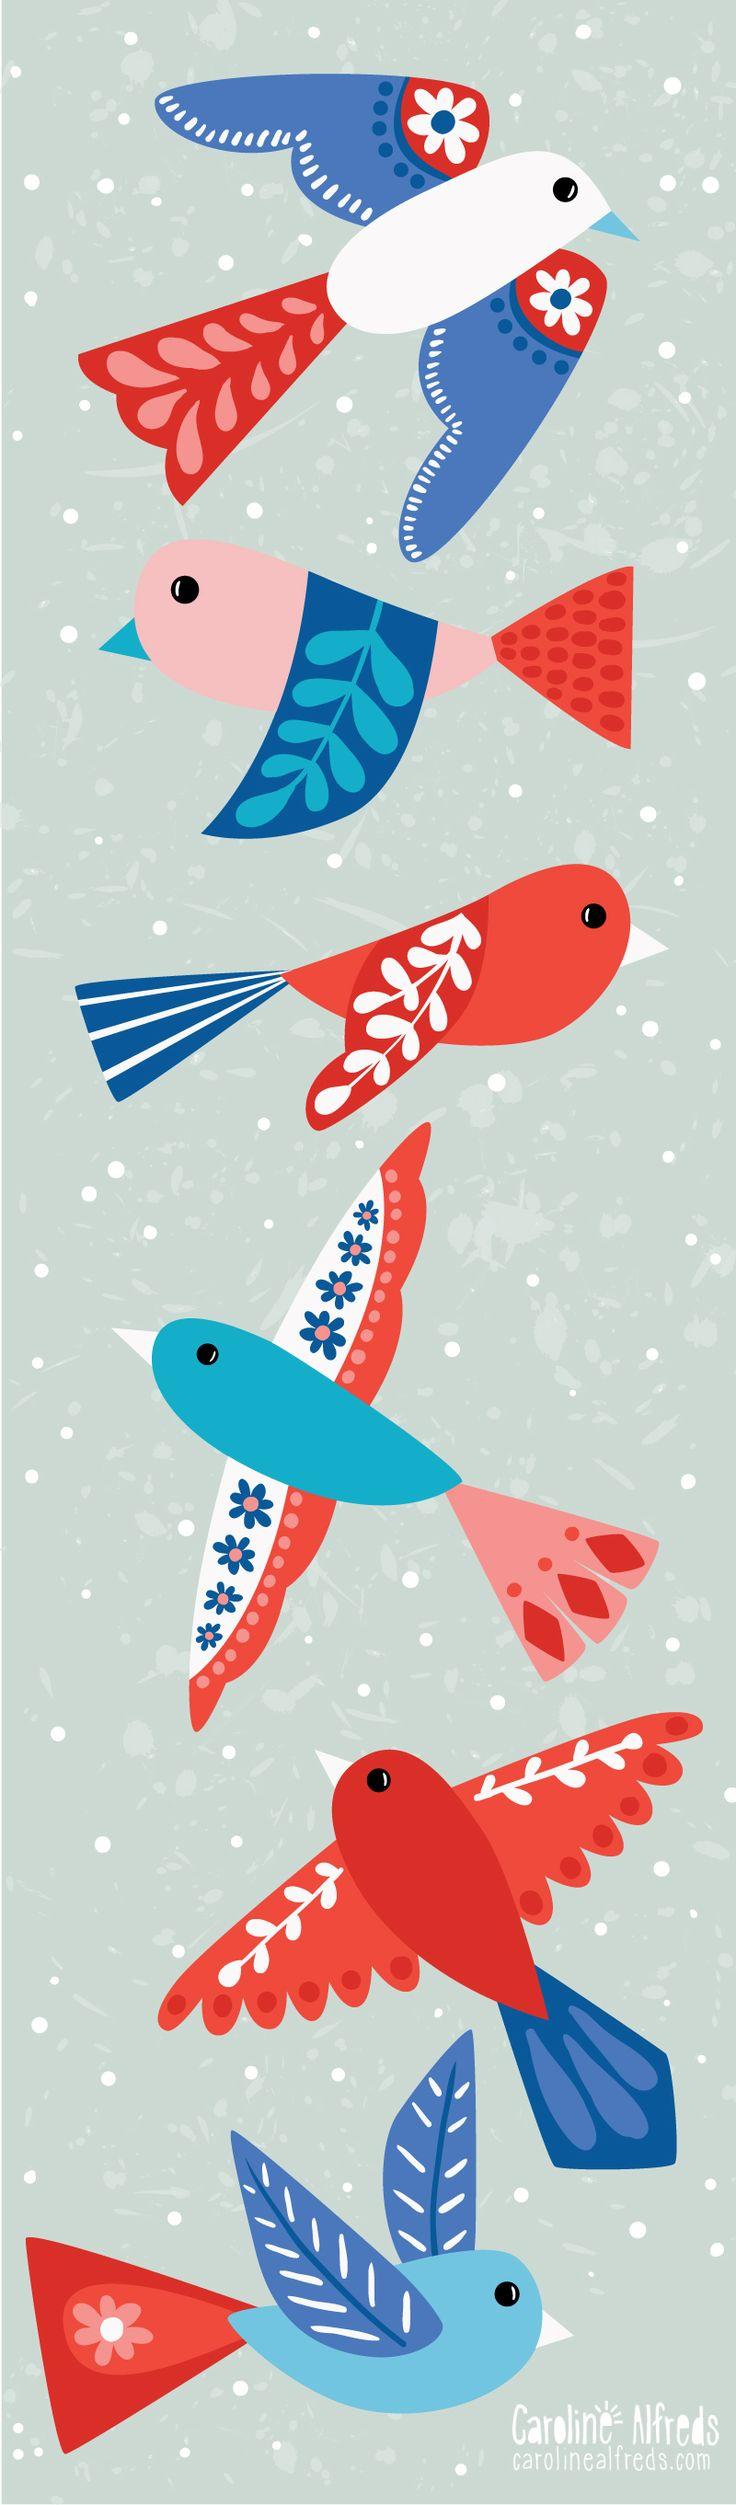 Birds illustration - Caroline Alfreds